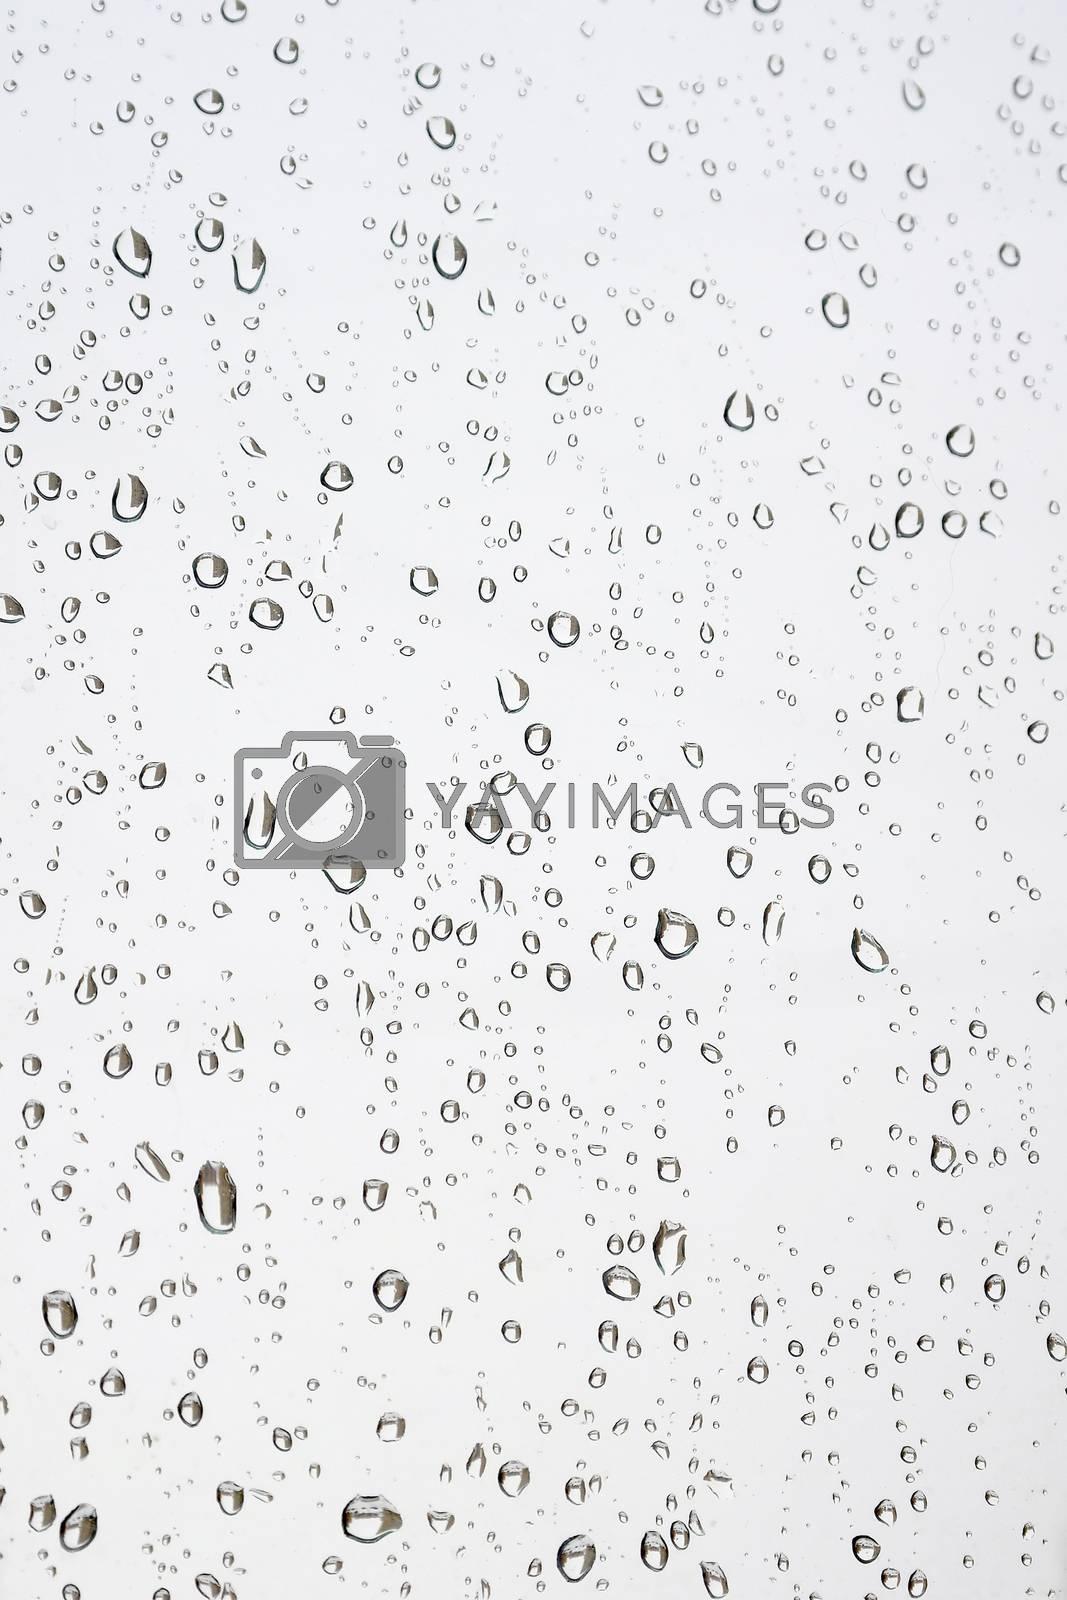 Drops of rain on the window by sergpet